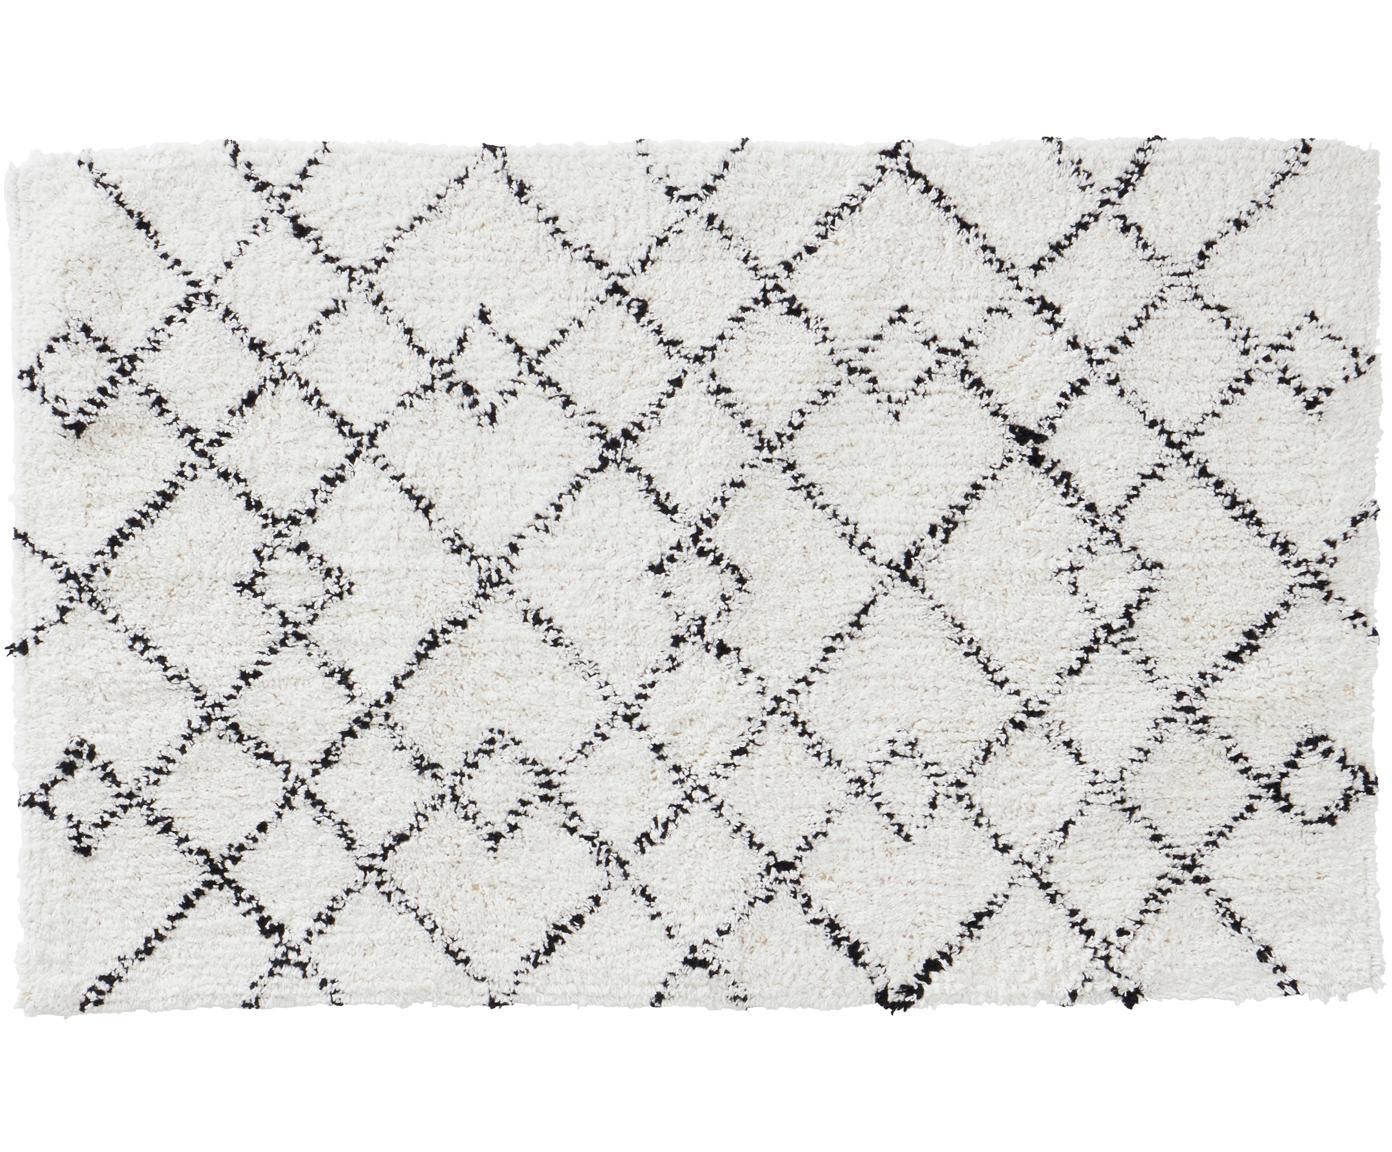 Badmat Paola, Katoen, Wit, zwart, 50 x 80 cm